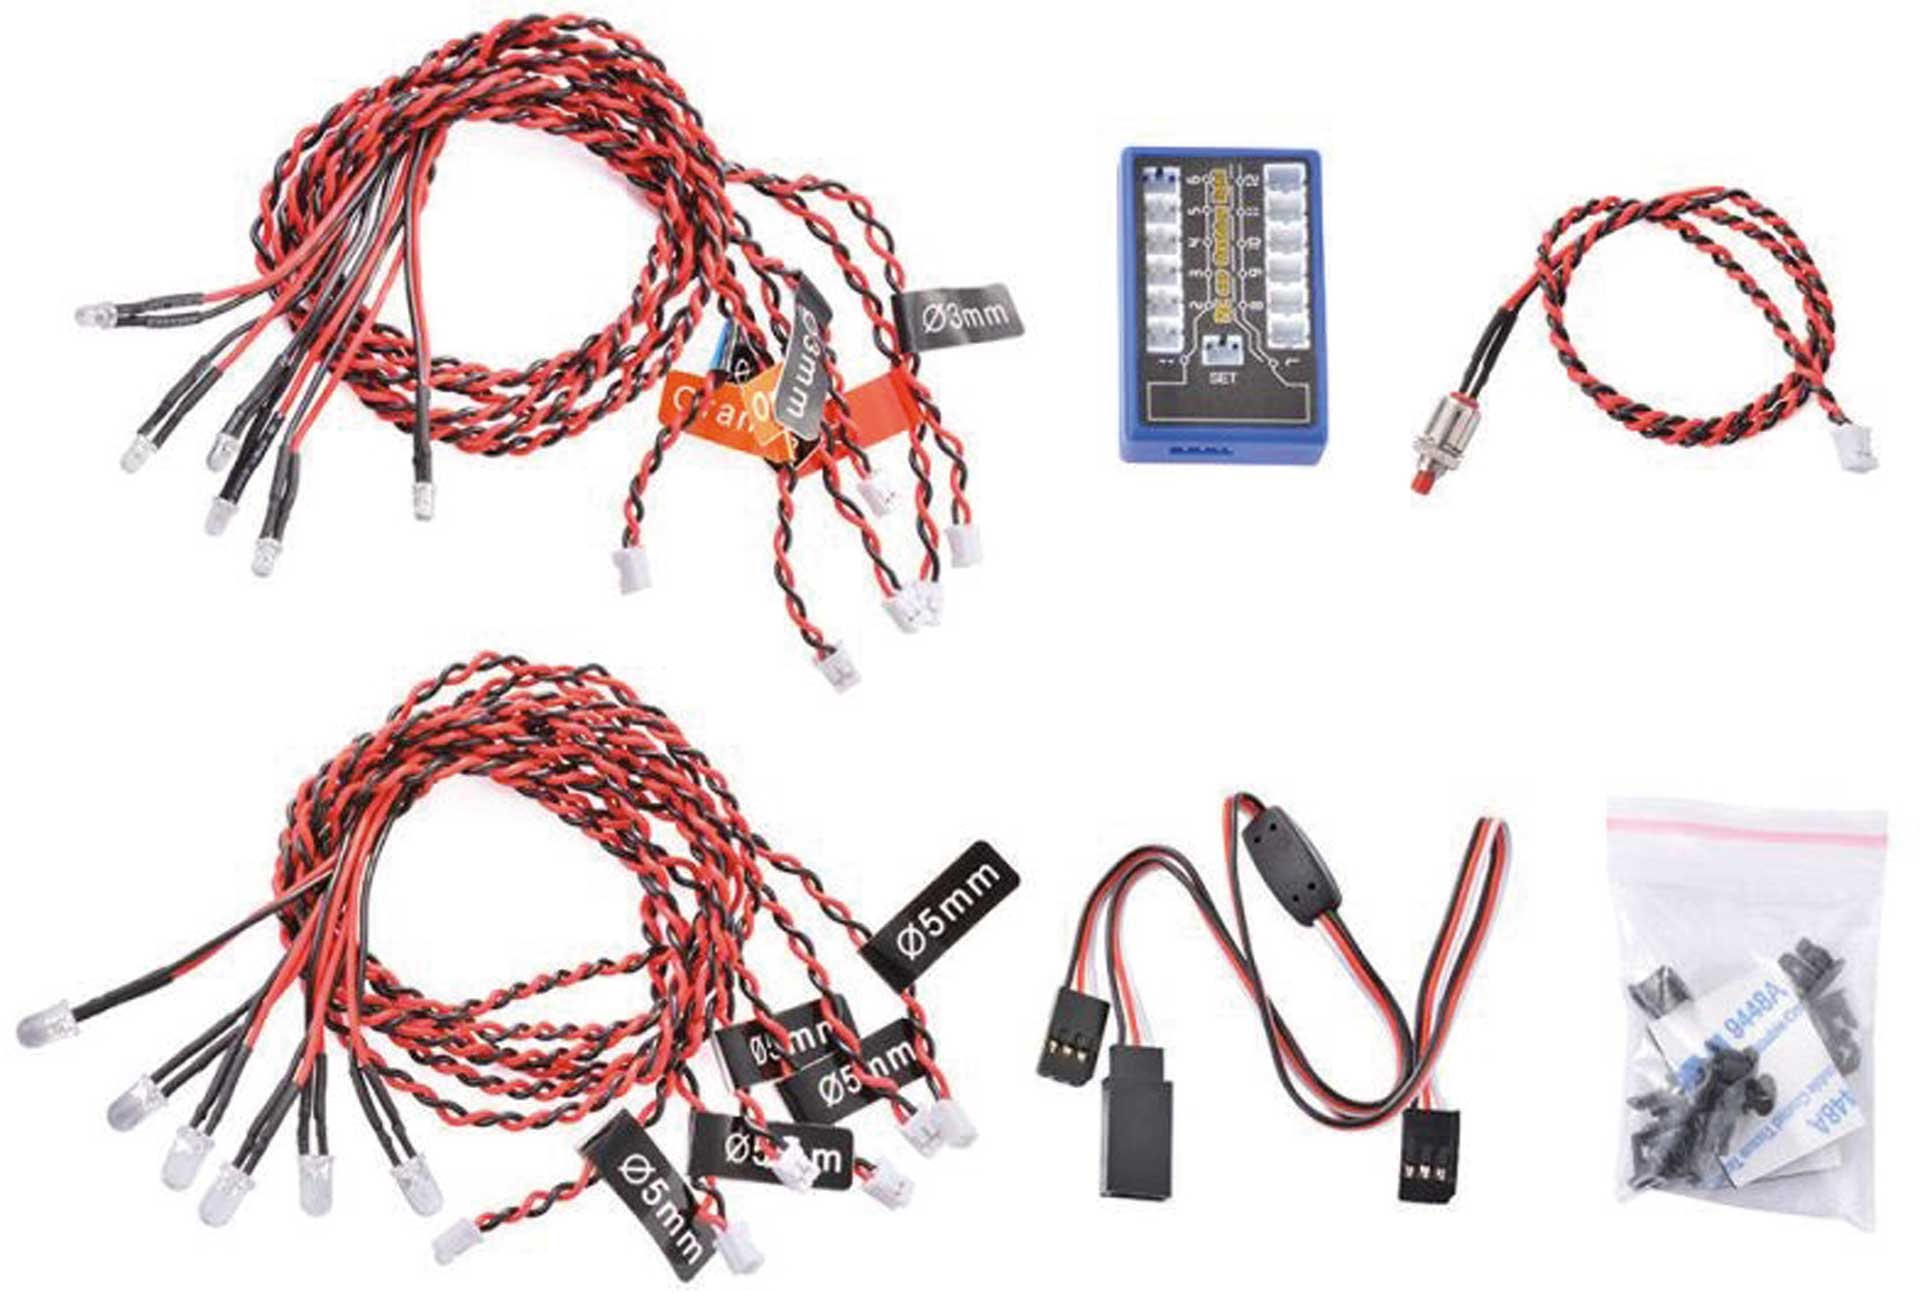 H-SPEED LED-KIT 12X 4,8-6,0 VOLT MIT KONTROLLBOX MULTICOLOR FLASHING H-SPEED FÜR RC-CAR, HELIS, FLUGZEUGE & DRONEN